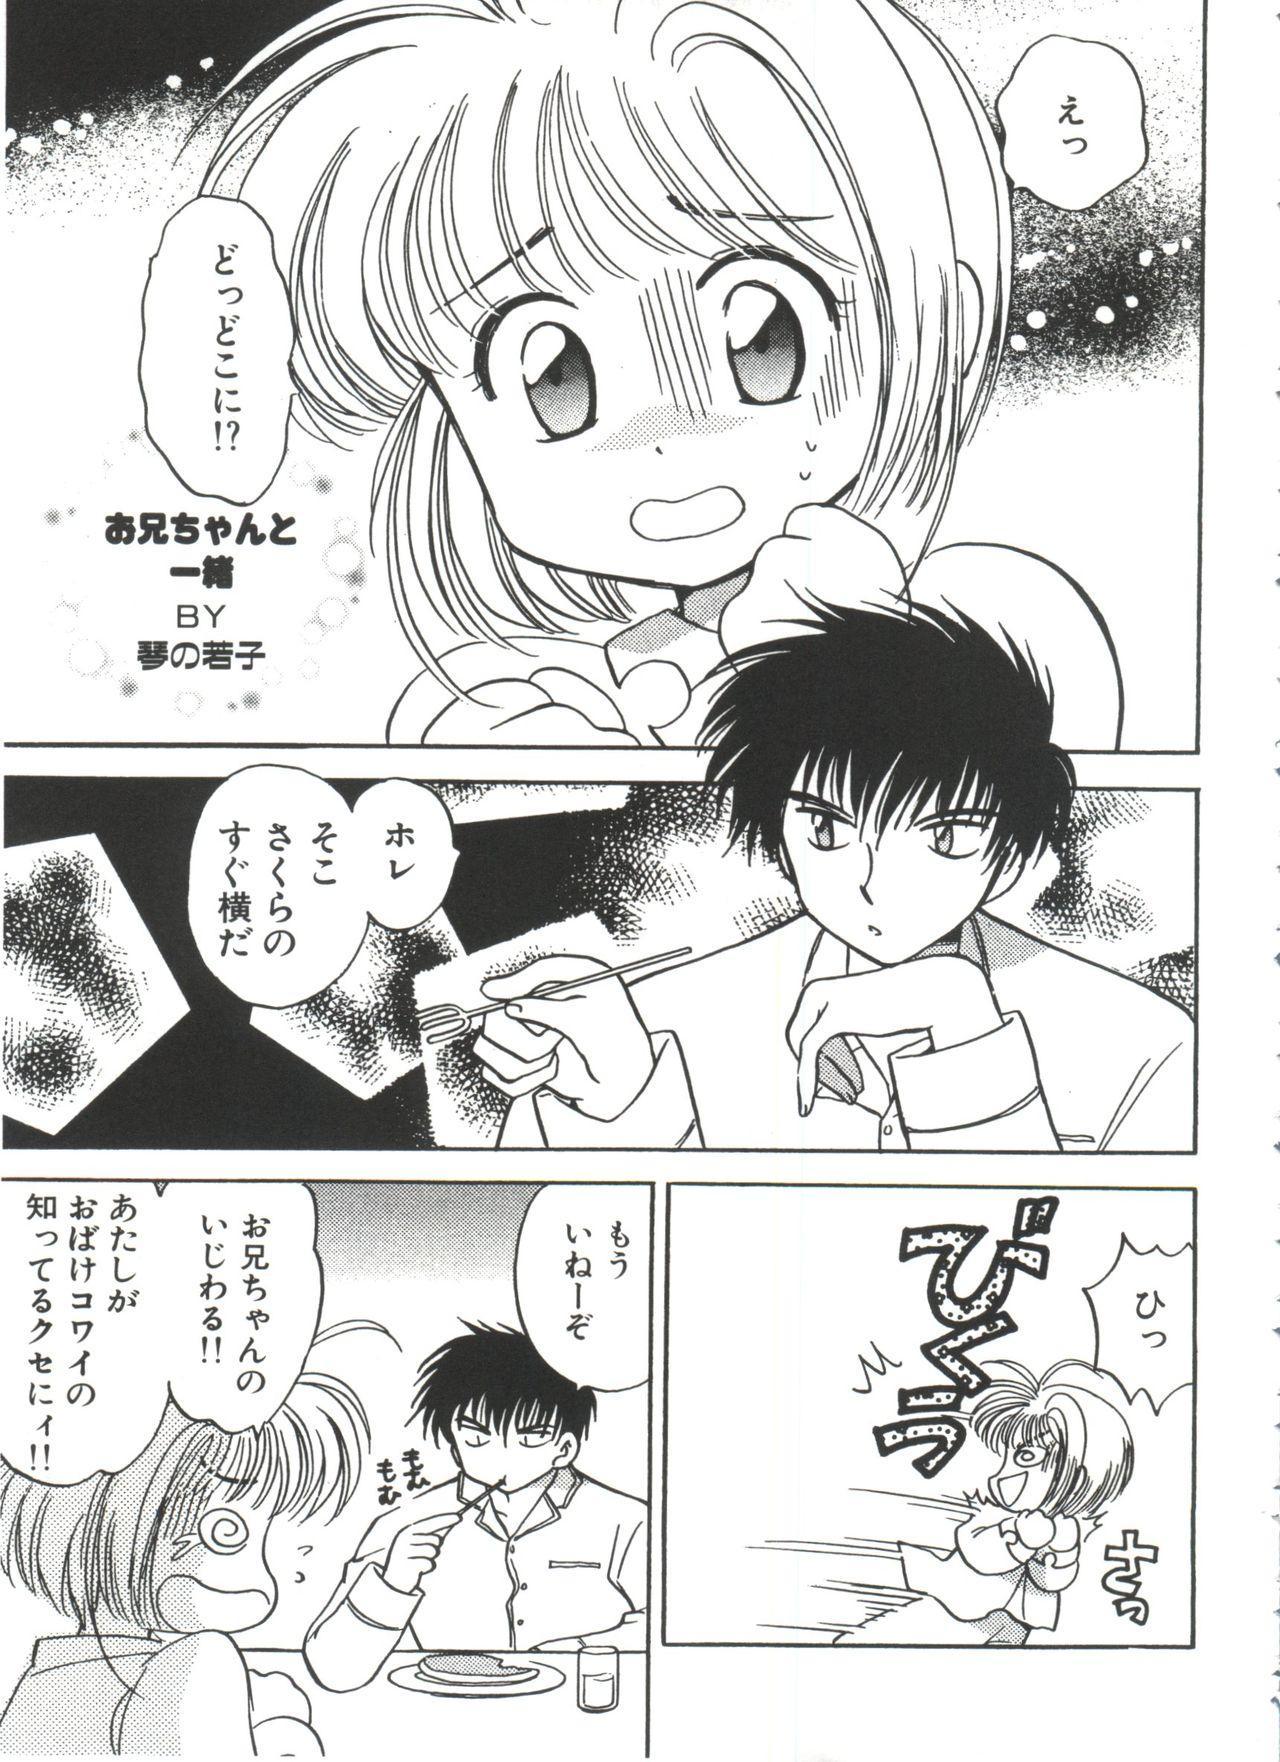 Ero-chan to Issho 2 22